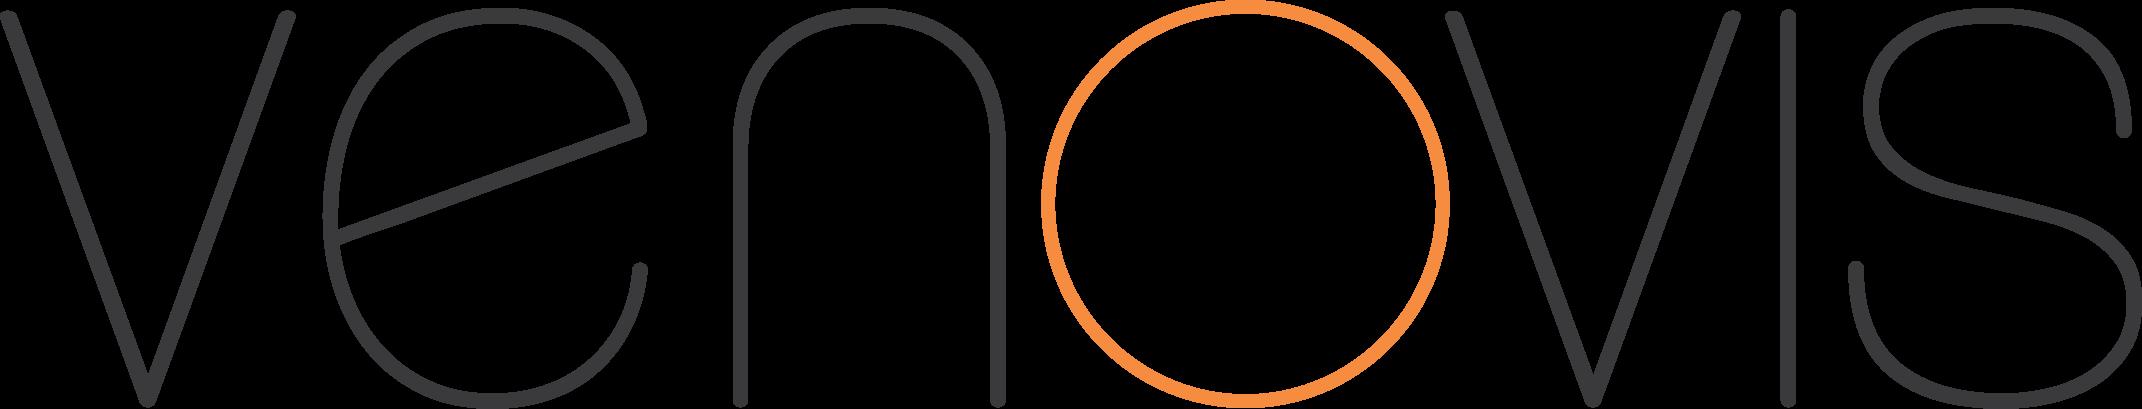 Venovis Logo